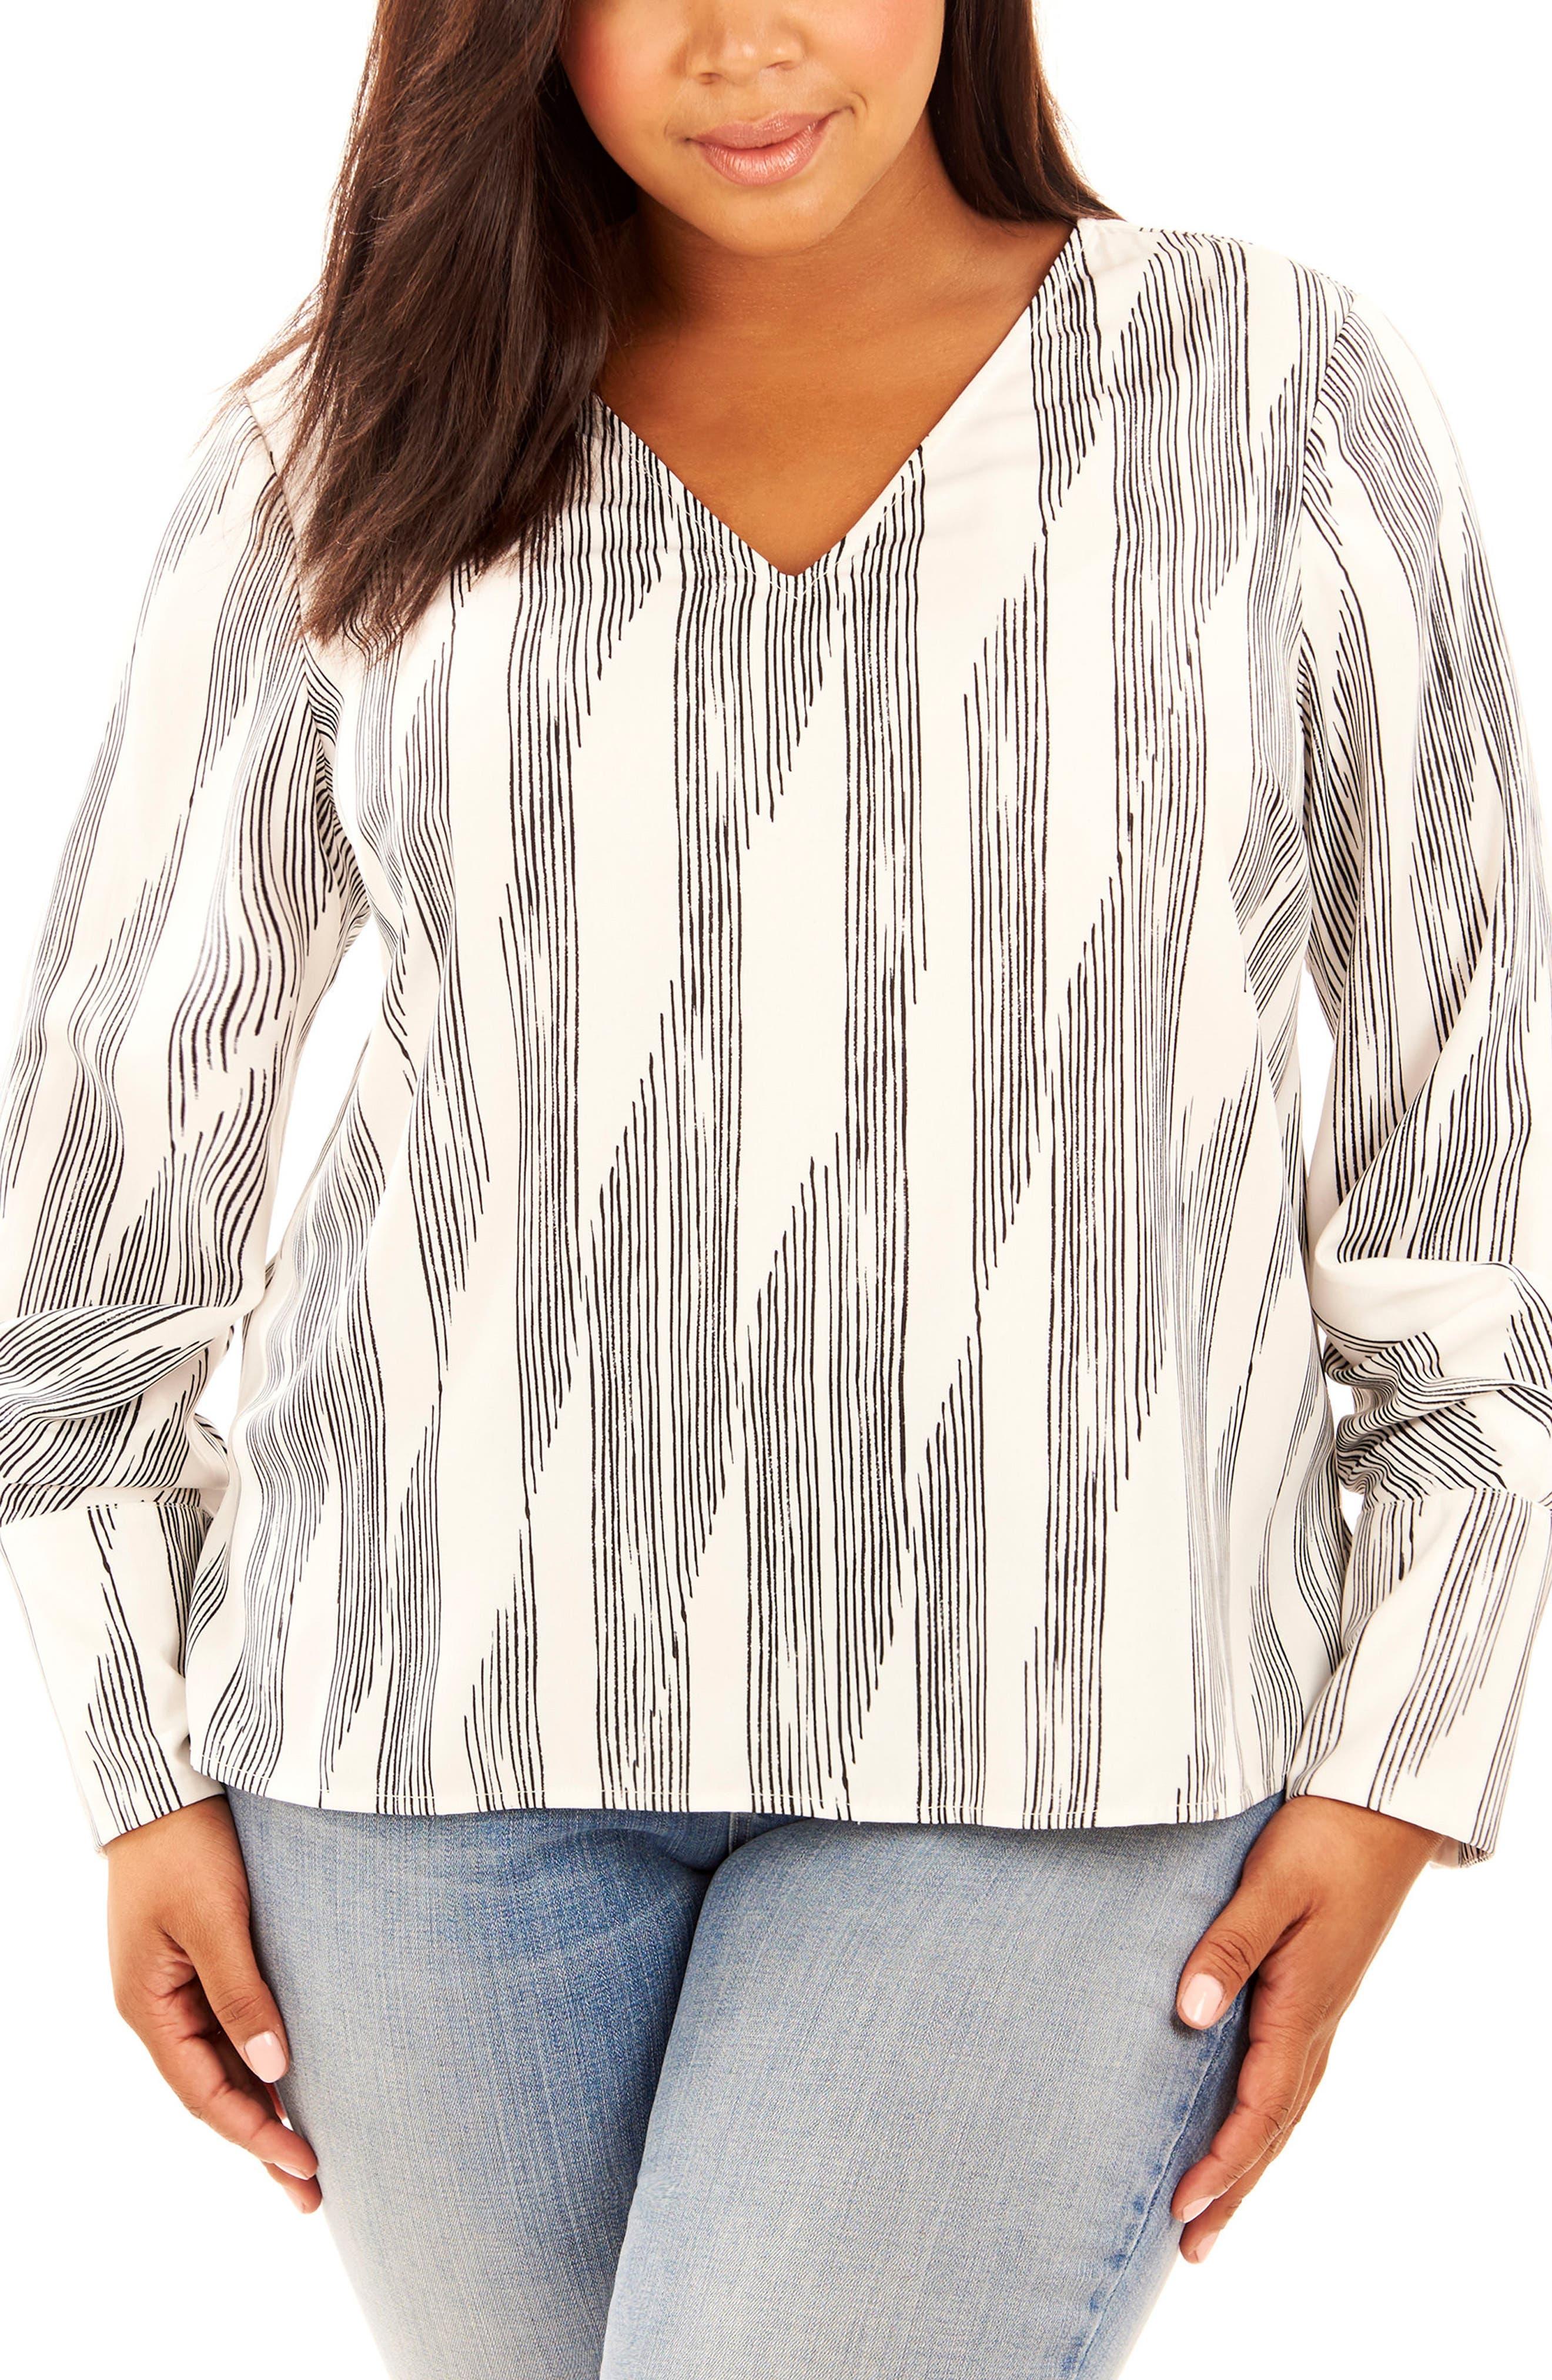 REBEL WILSON X ANGELS Print Pleated Sleeve Top, Main, color, 100